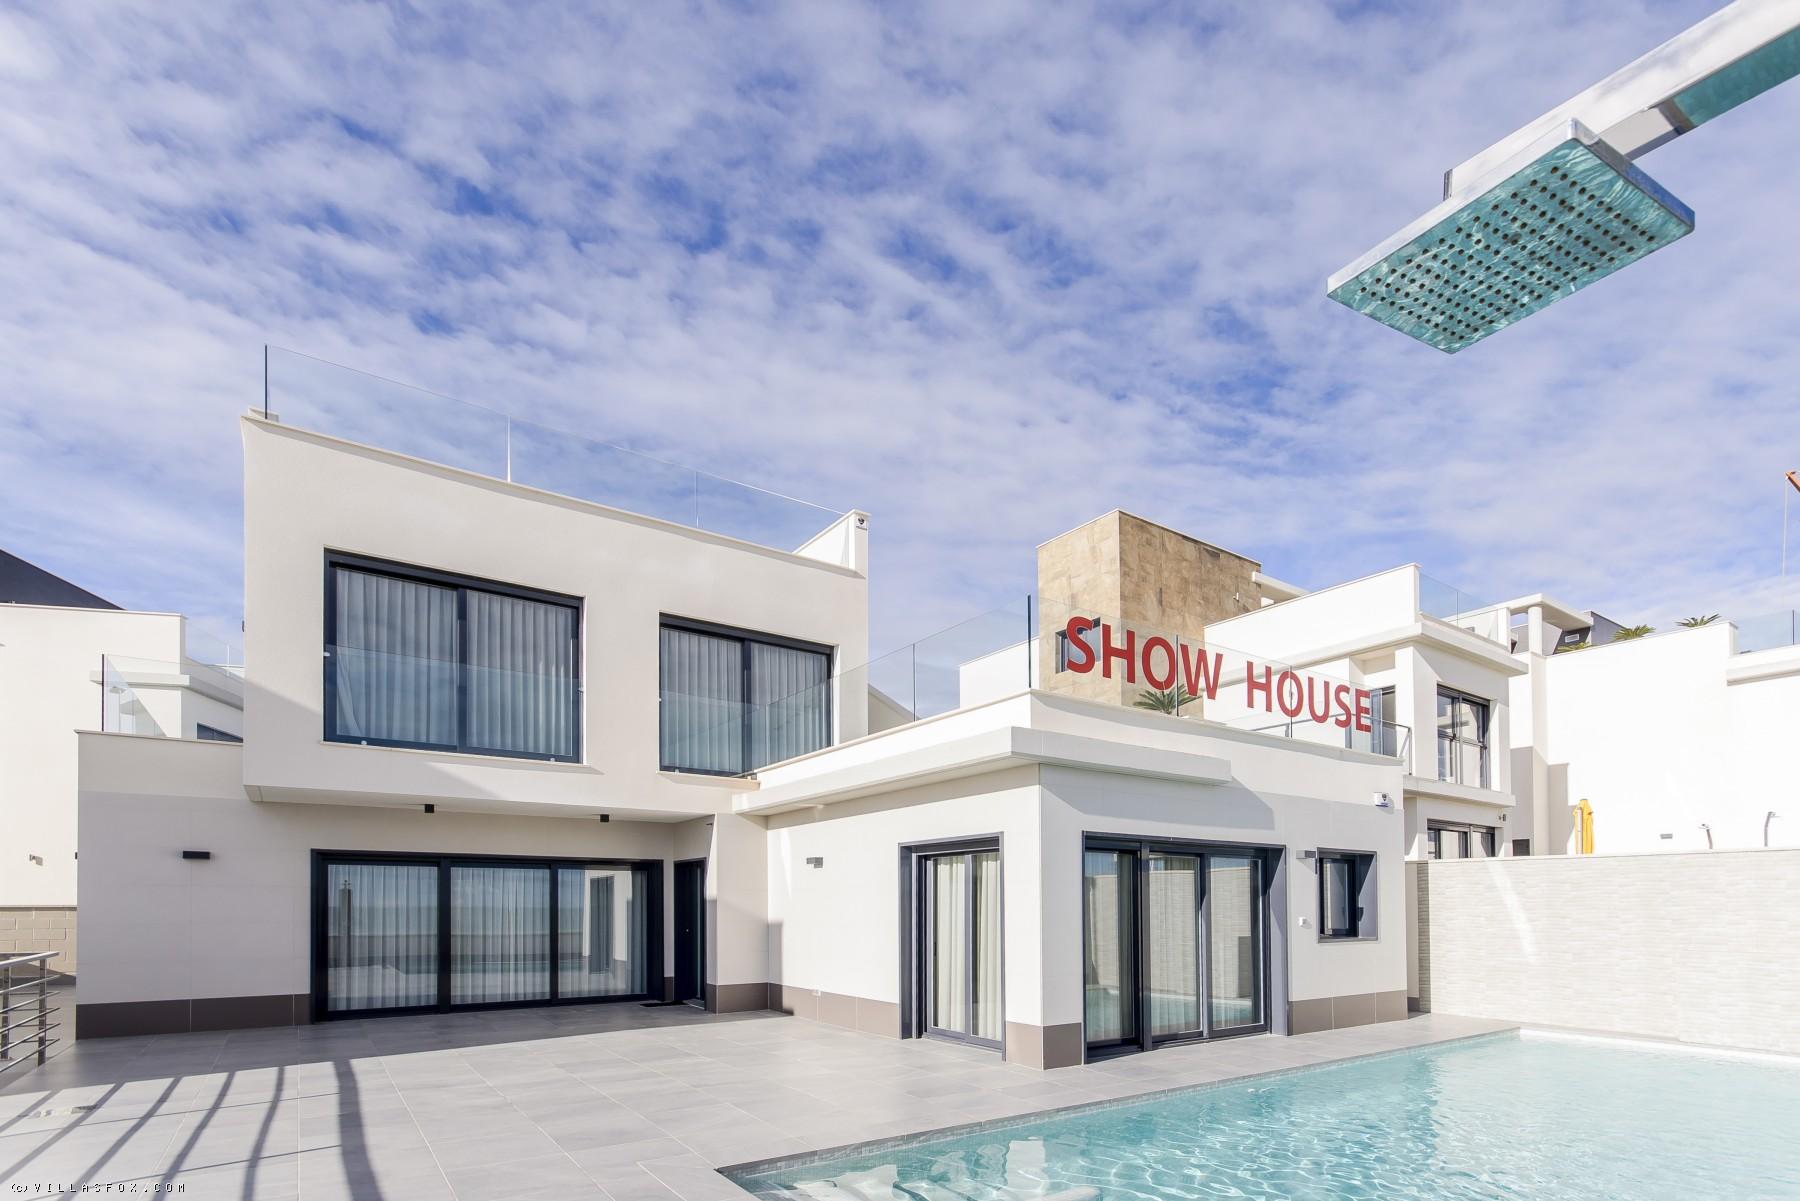 New-build 3-bedroom Penelope-model villas, Bellavista